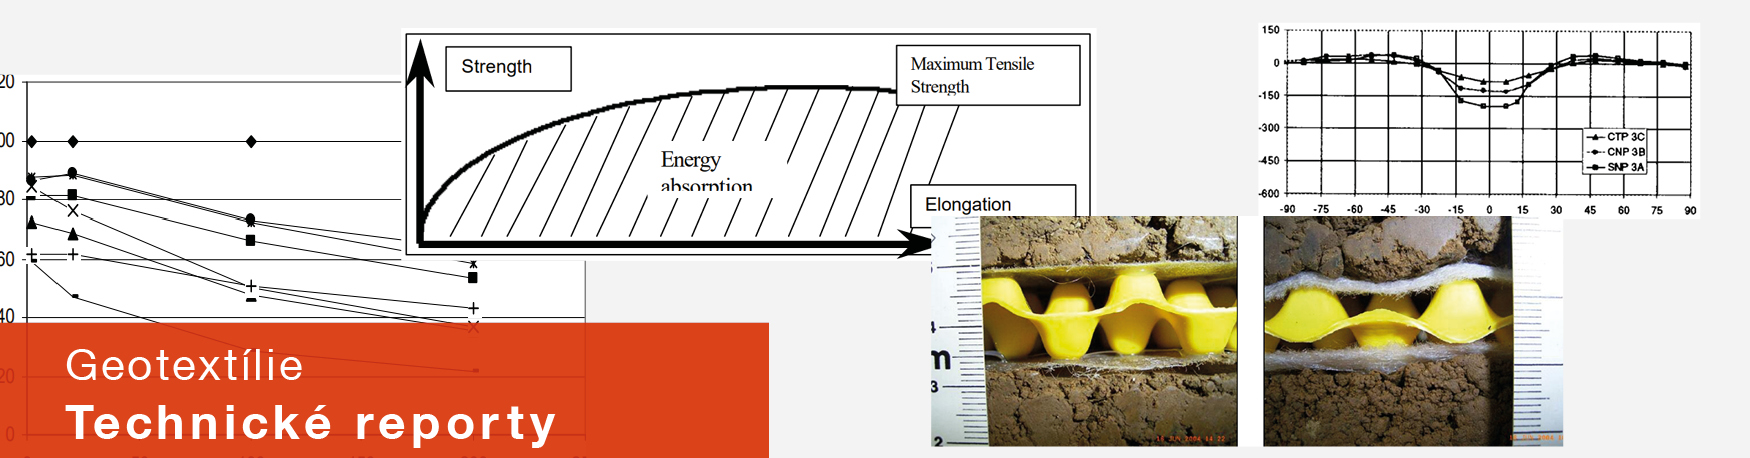 polypropylenove-geotextile-technicke-reporty-parametre-porovnanie-kvalita-Typar